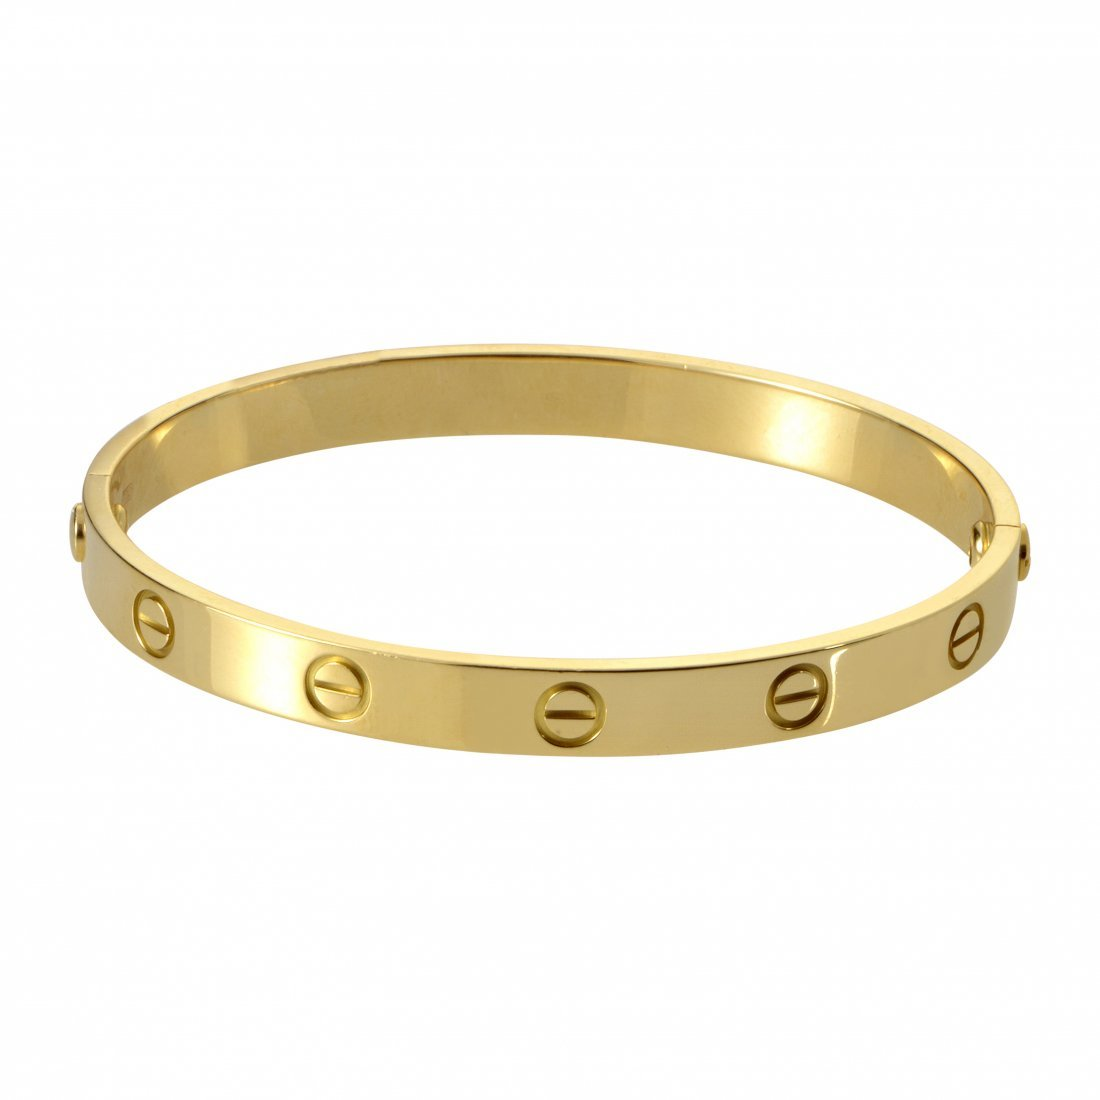 Cartier LOVE 18K Yellow Gold Size 18 Bracelet